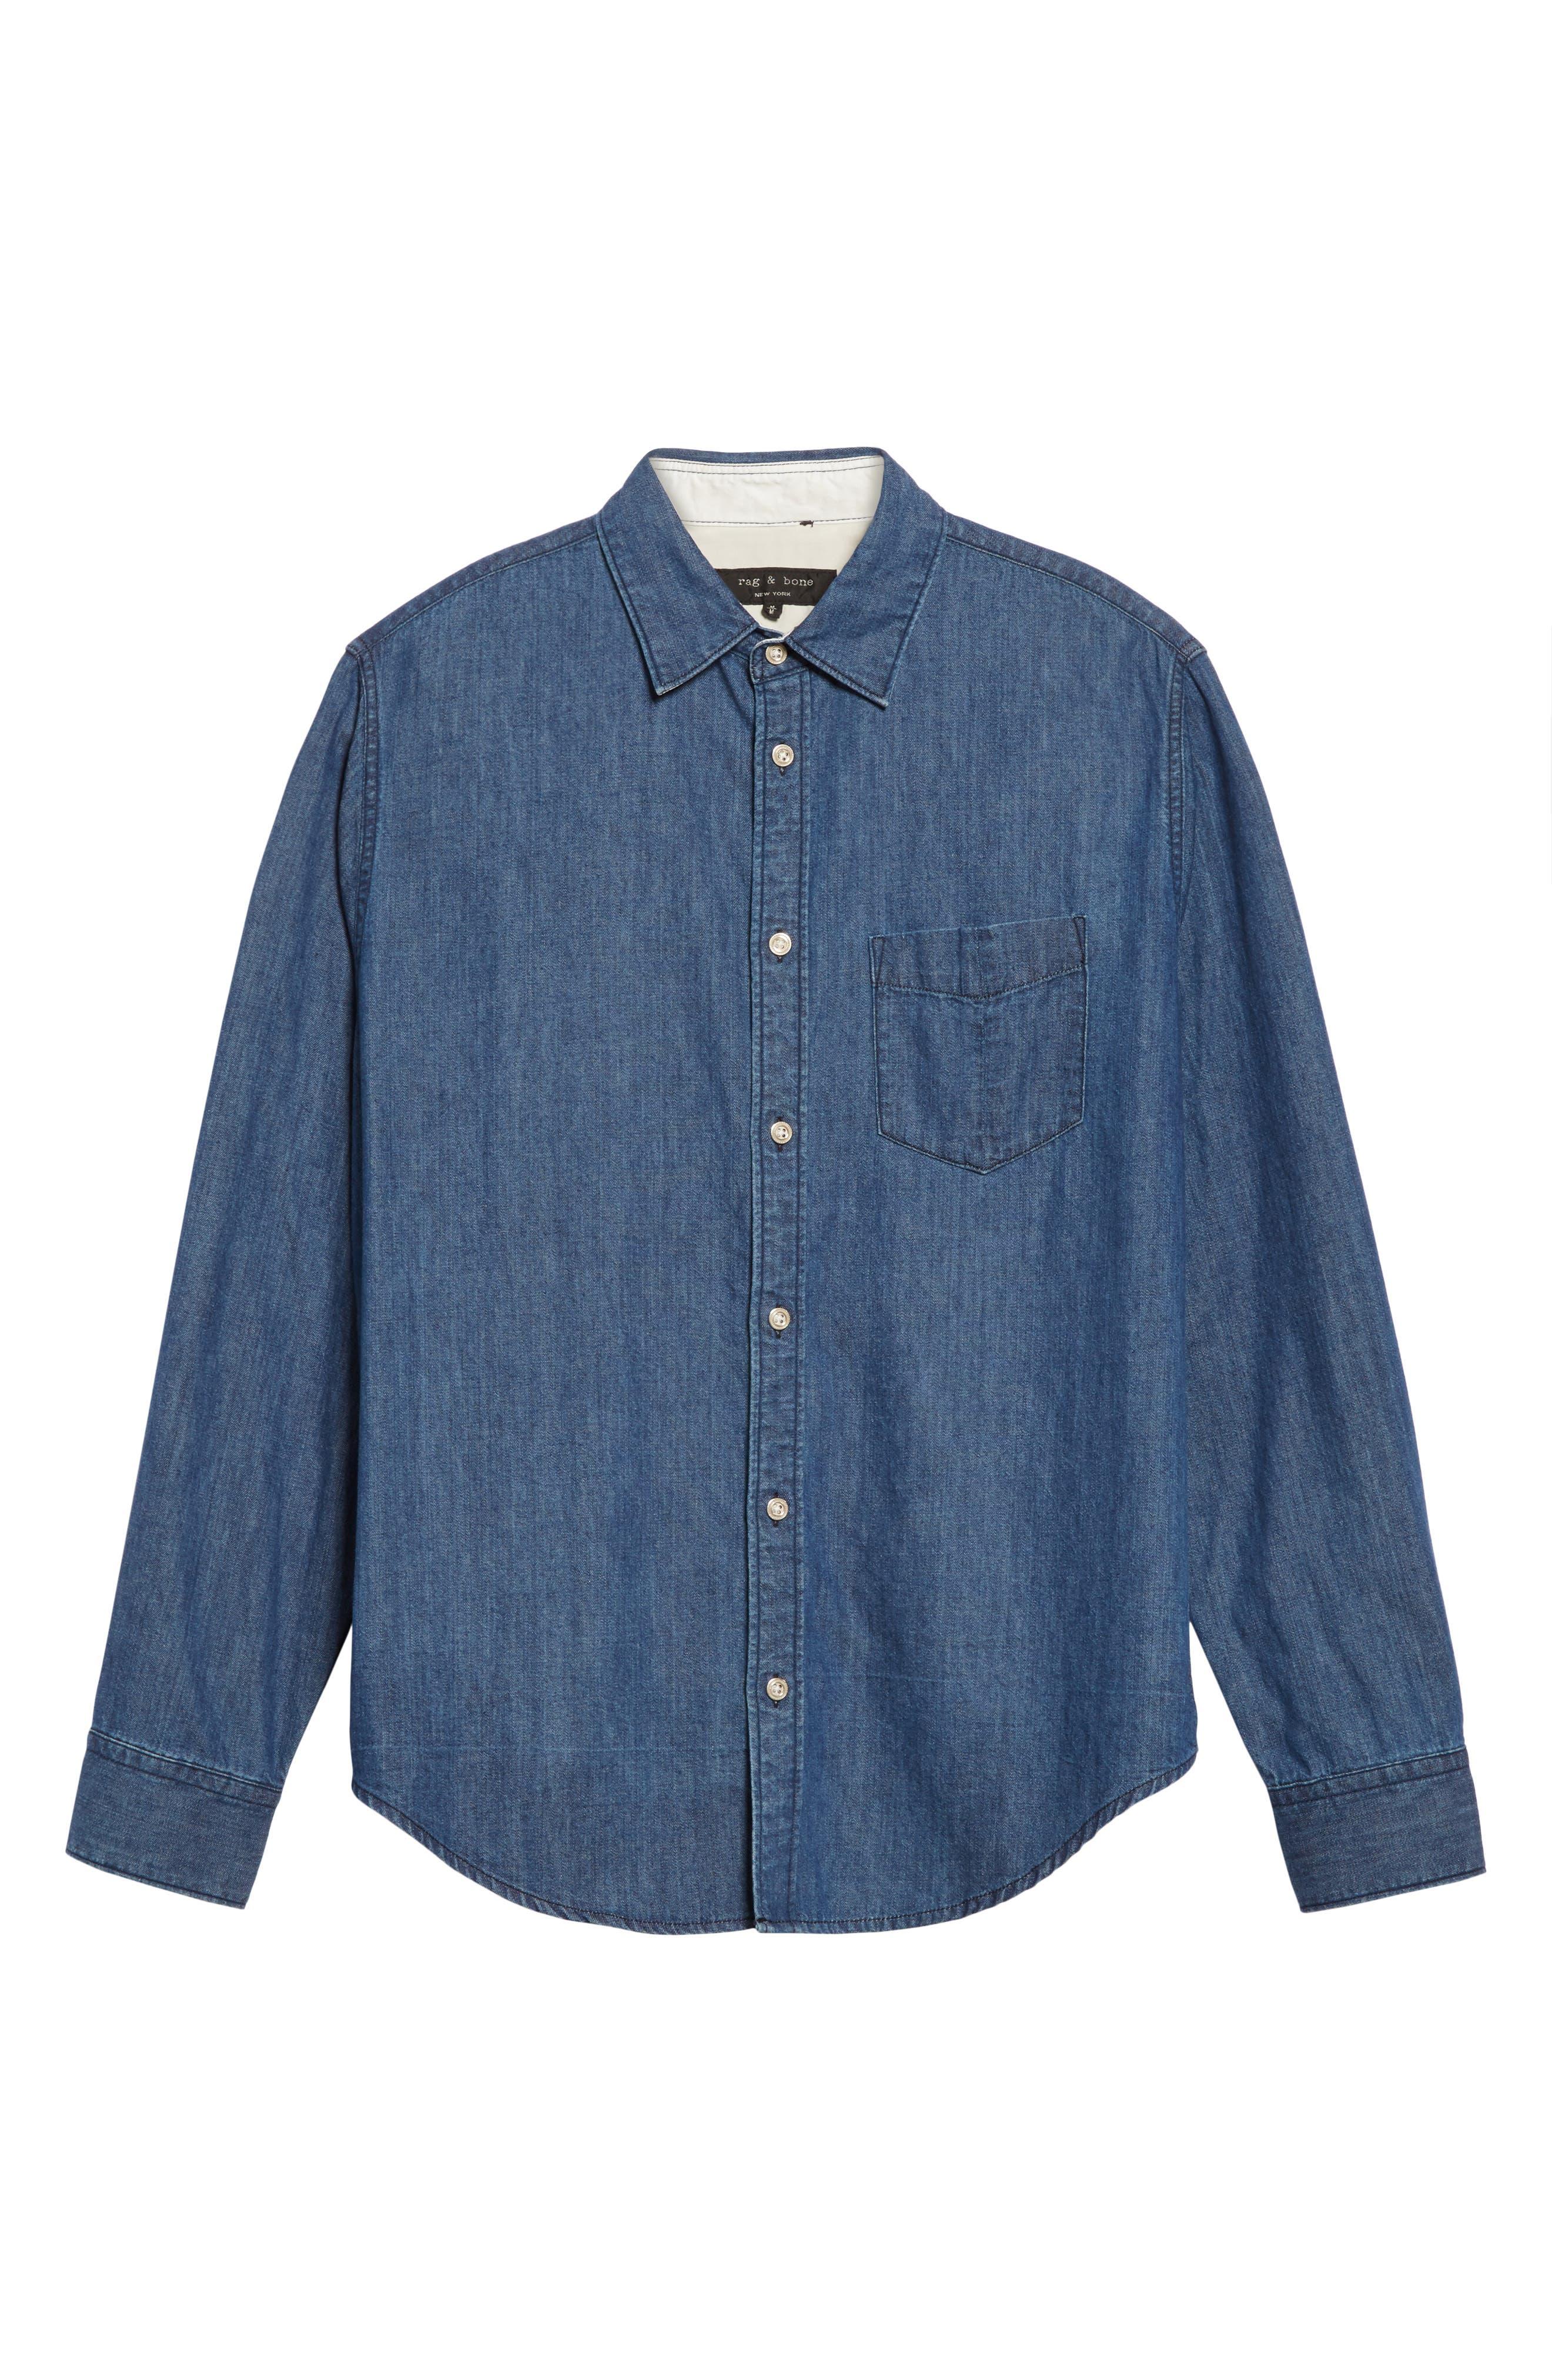 Fit 3 Woven Denim Shirt,                             Alternate thumbnail 6, color,                             Indigo